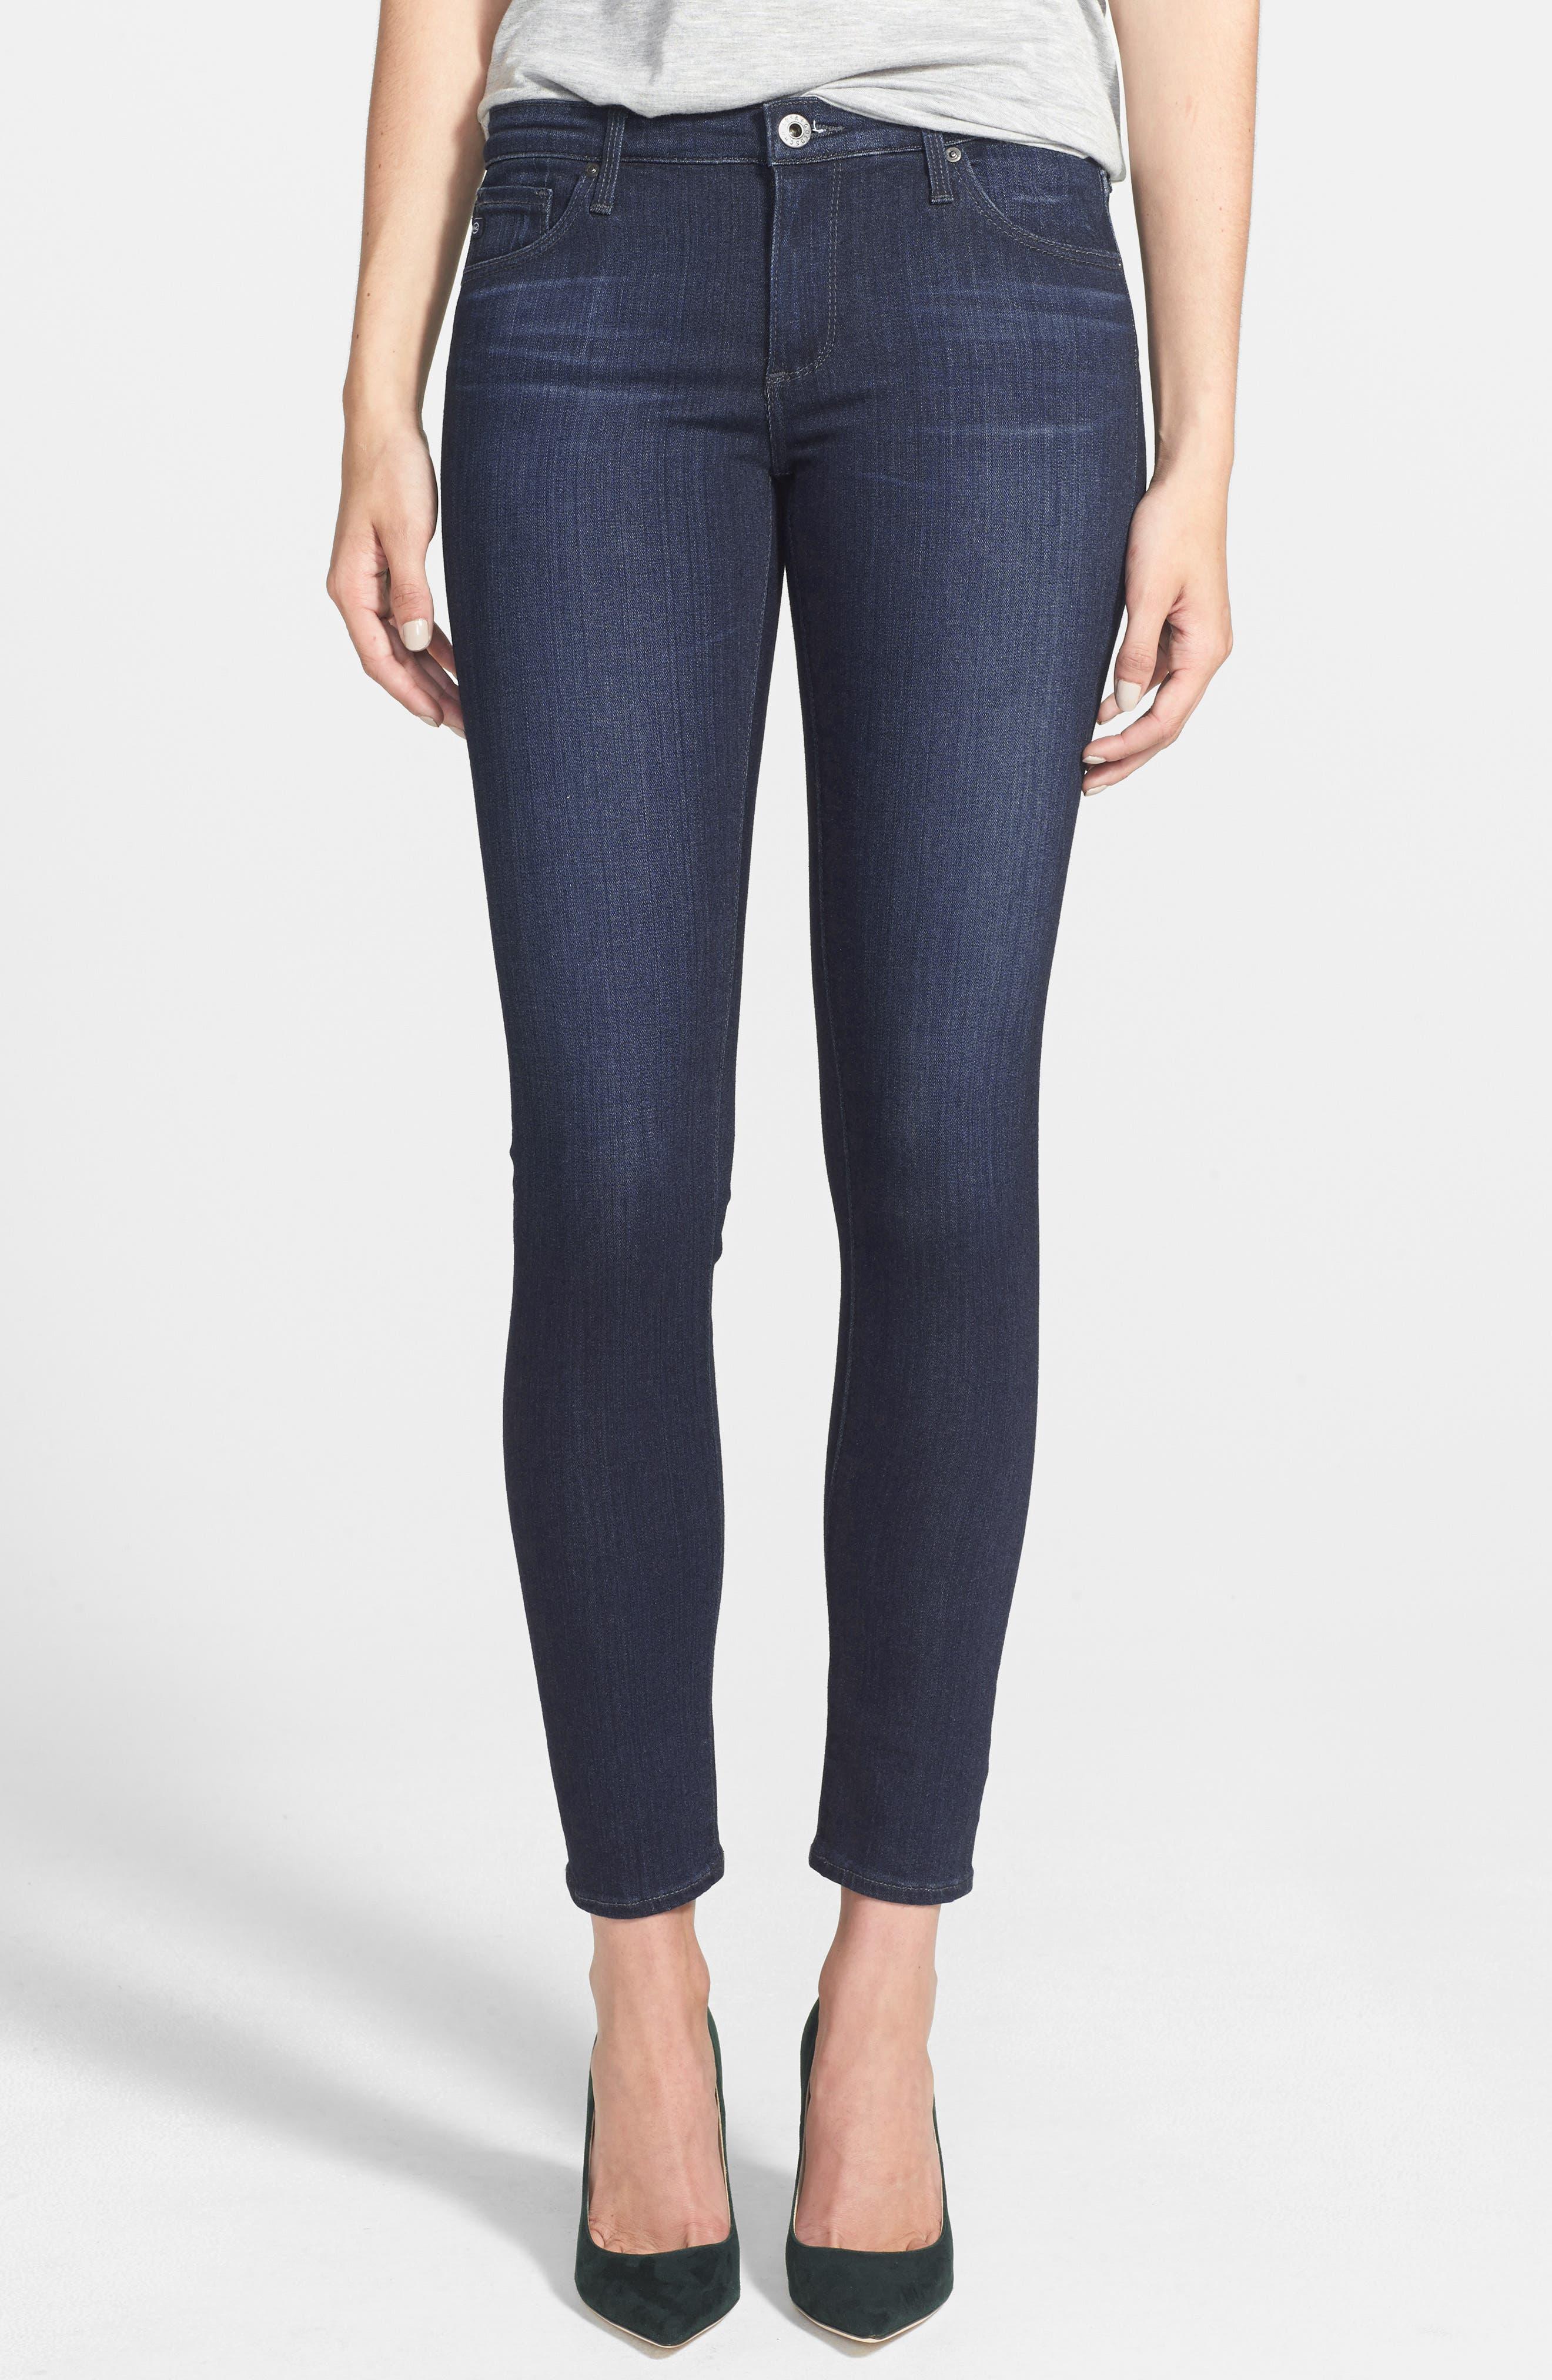 Alternate Image 1 Selected - AG Ankle Super Skinny Jeans (Coal Blue)